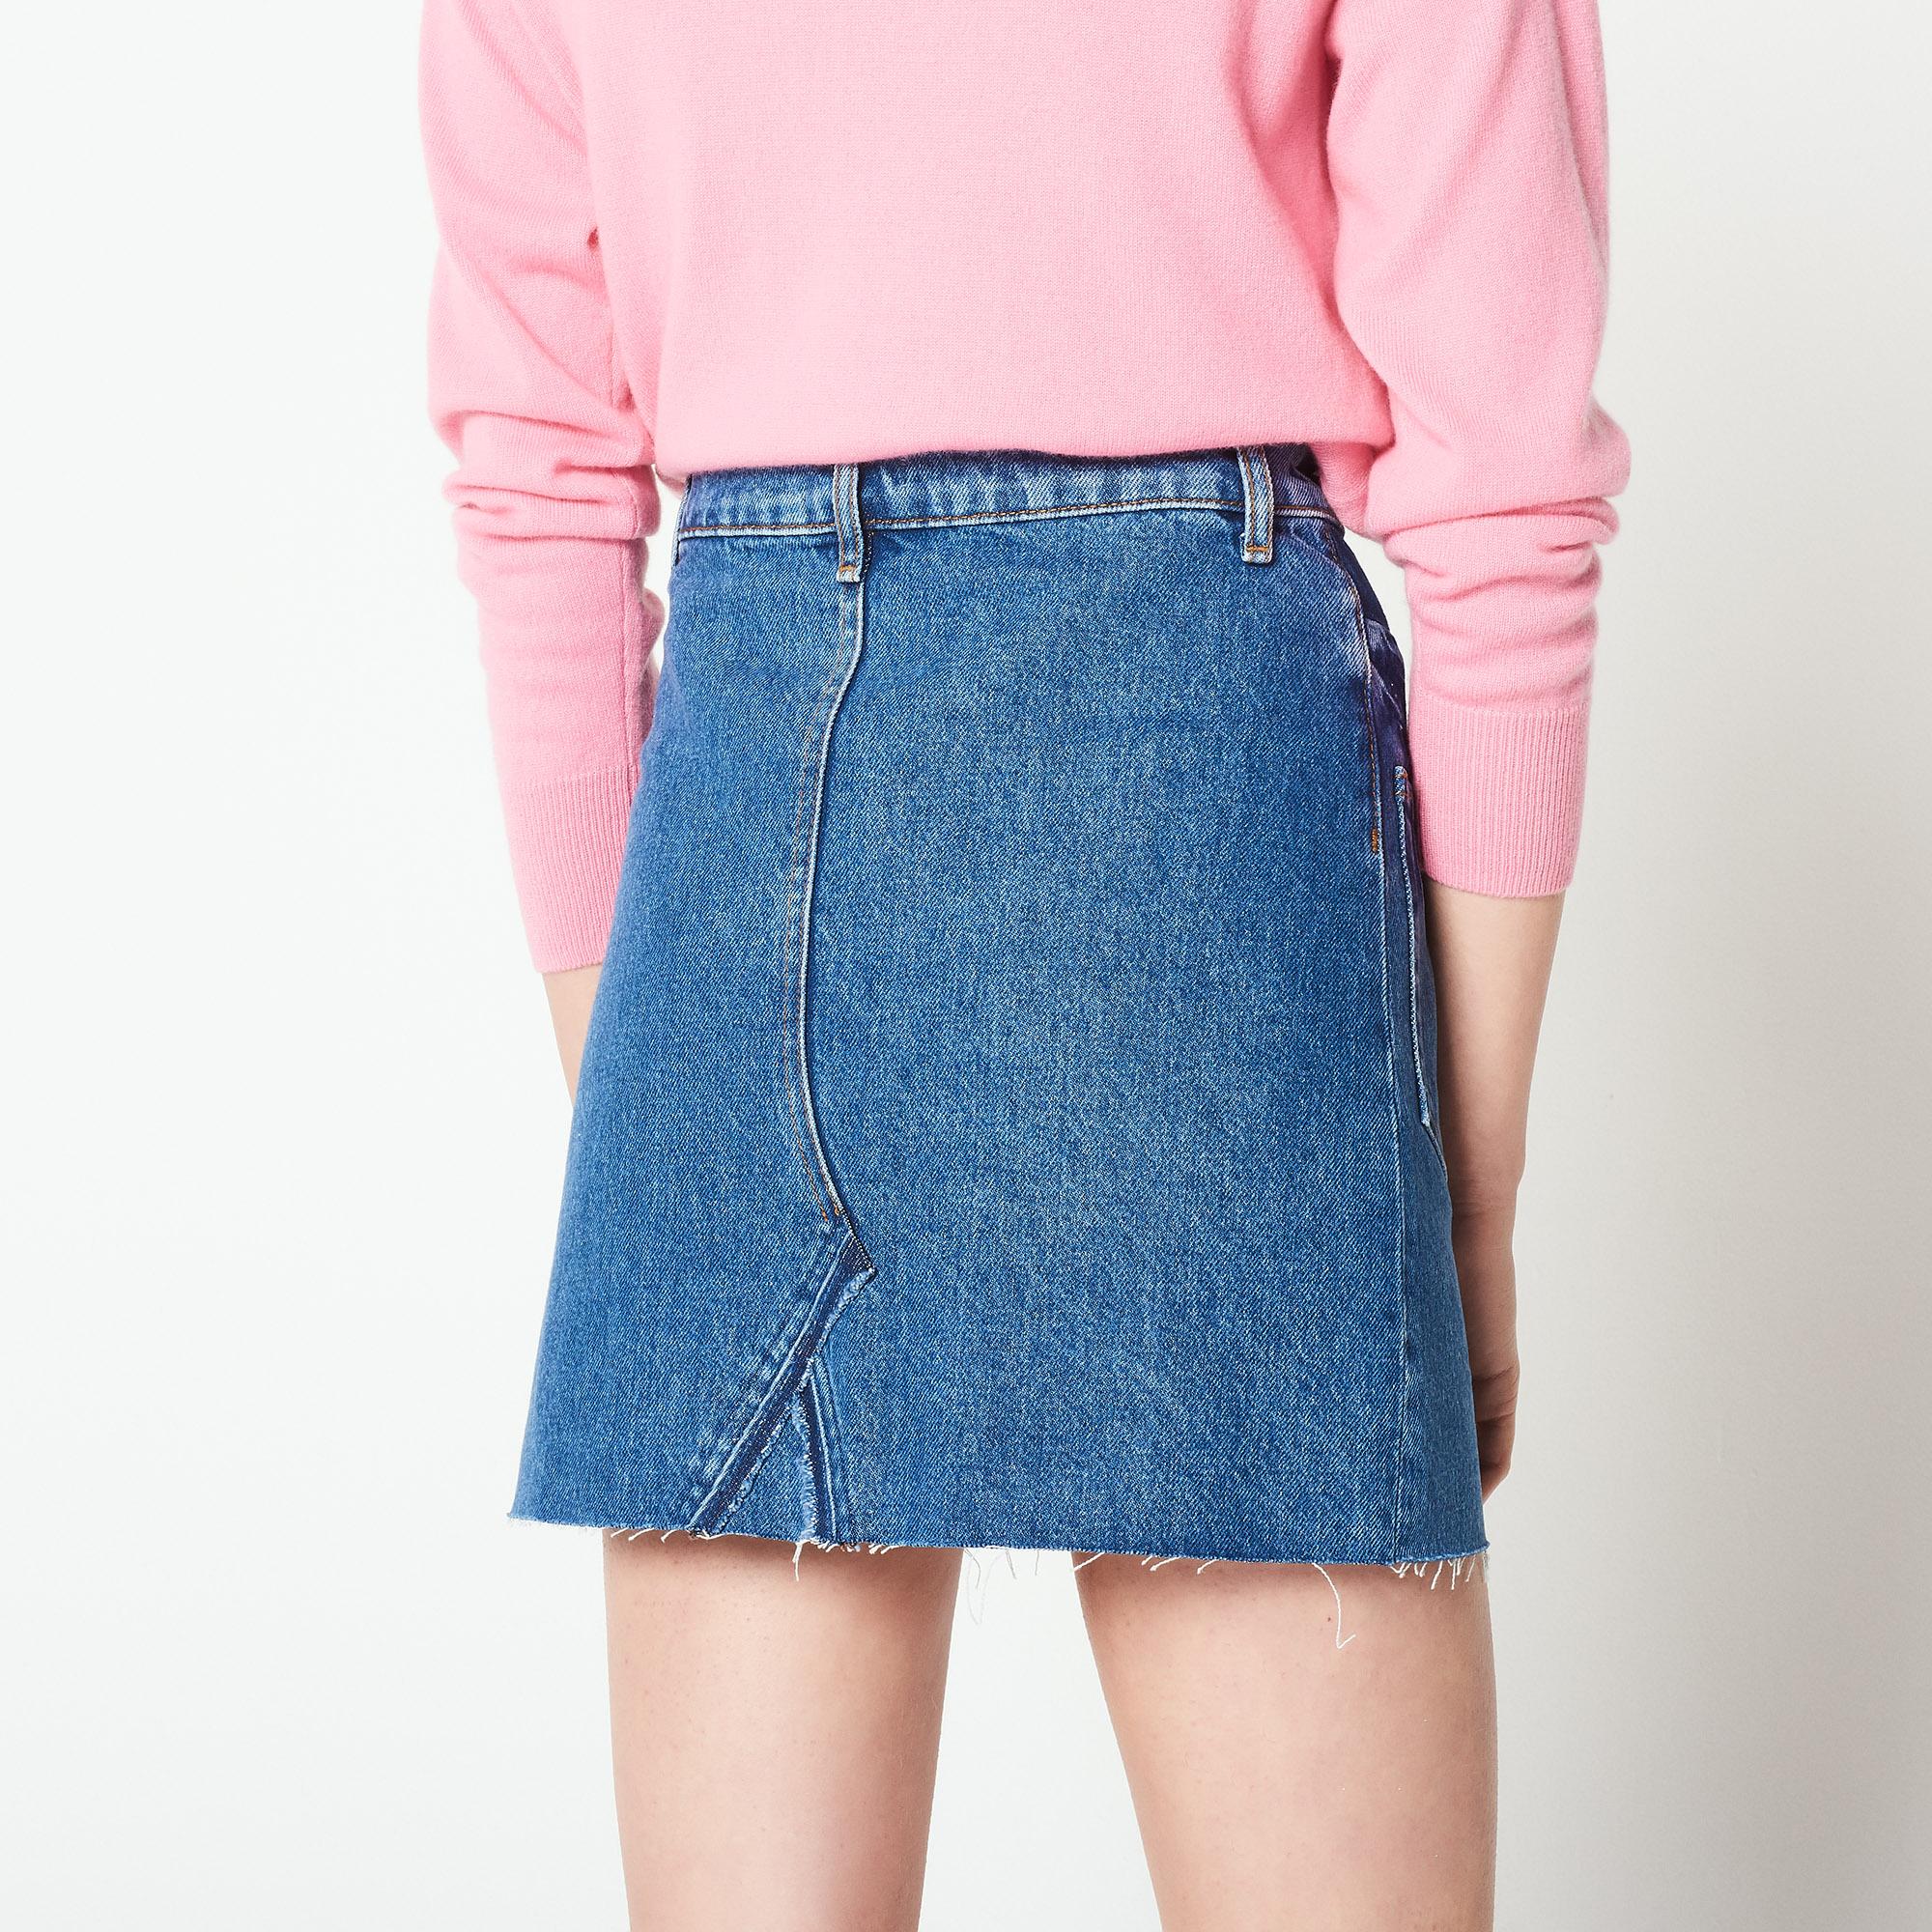 Gonna in jeans con effetto délavé : Collezione Estiva colore Blue Vintage - Denim